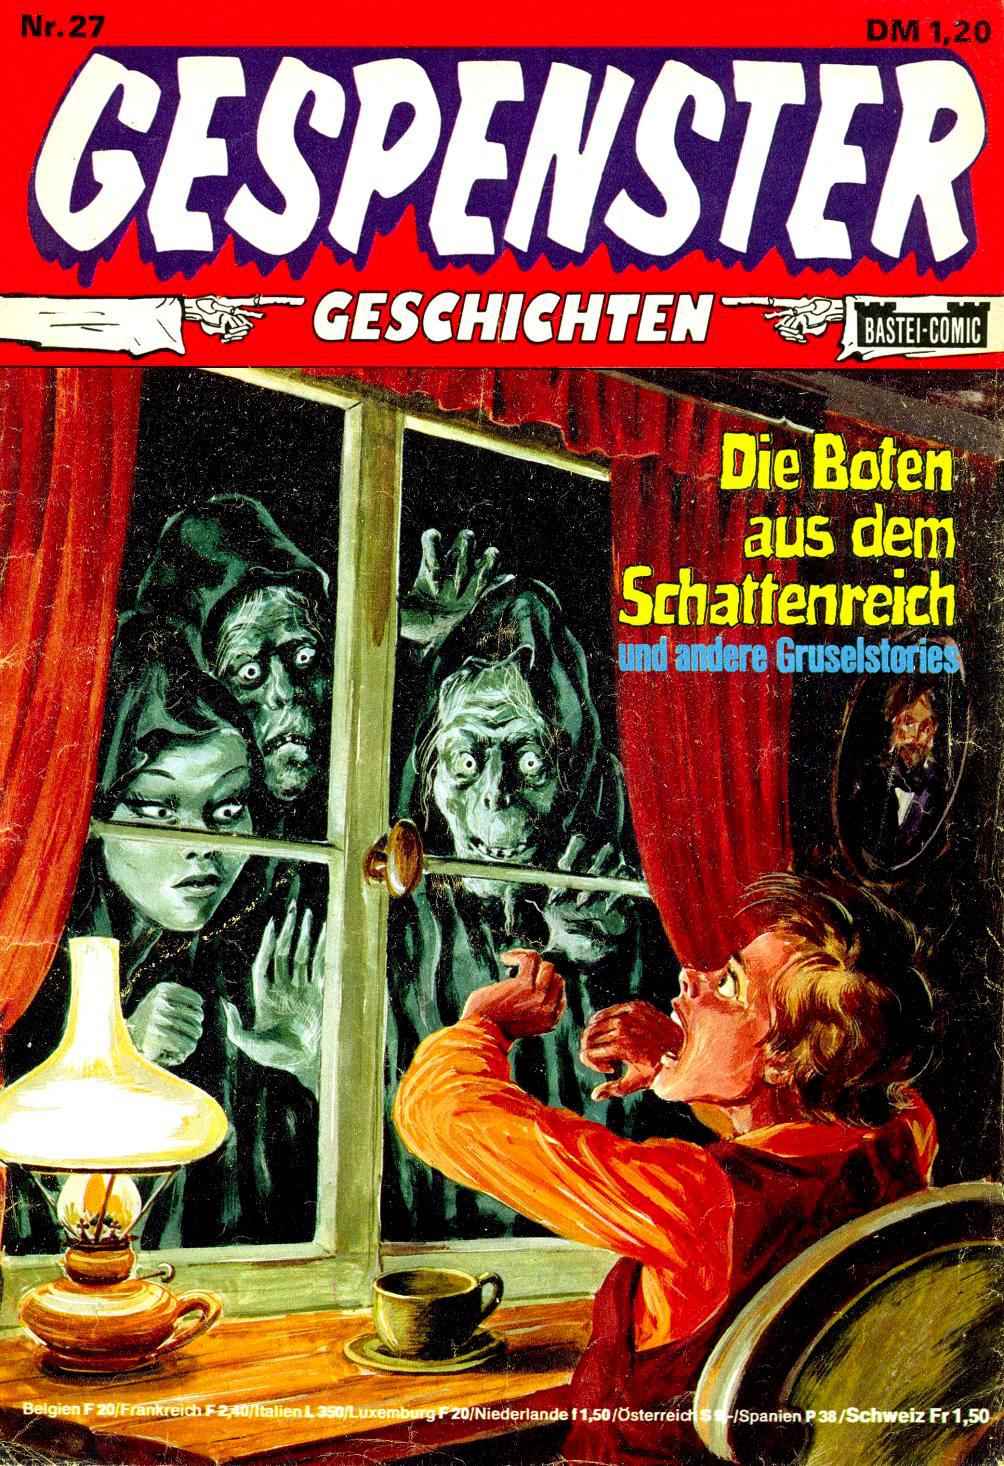 Gespenster Geschichten - 27